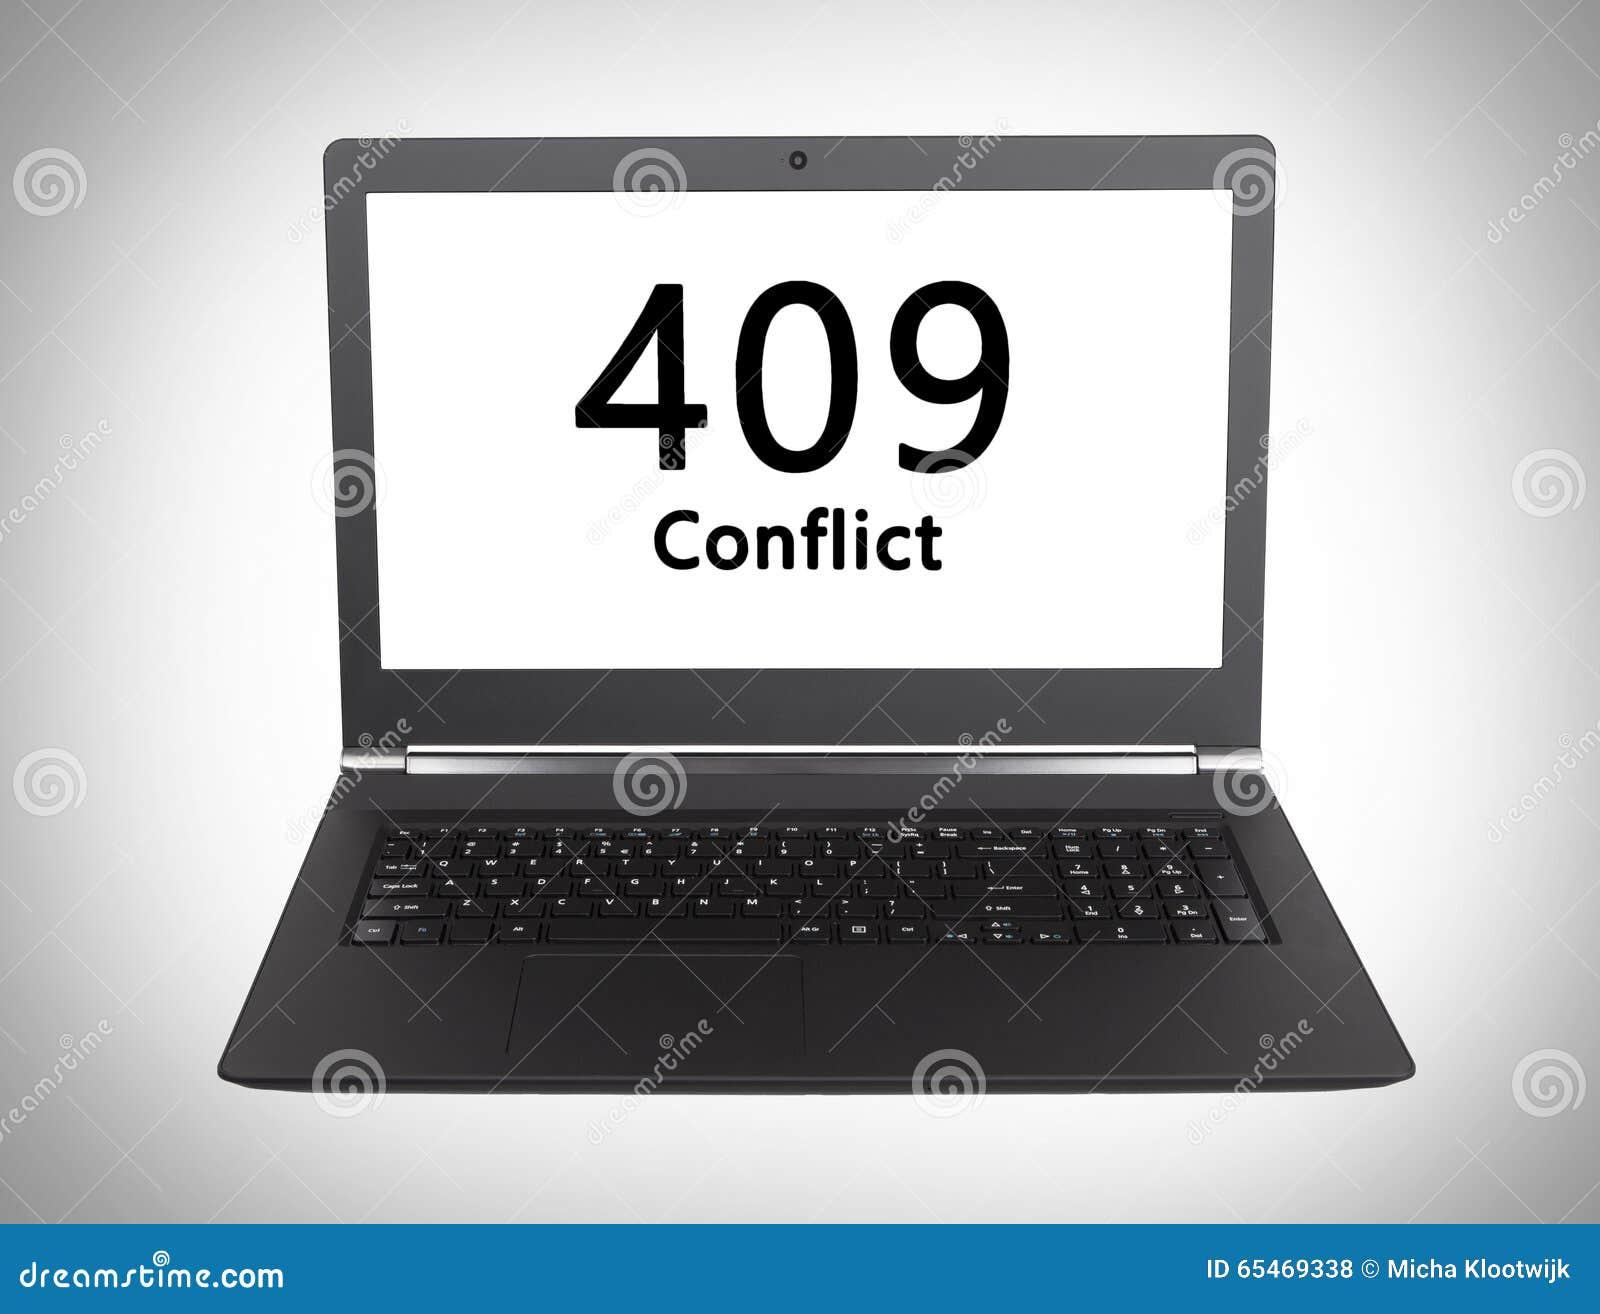 Http Status Code - 409, Conflict Stock Photo 65469338 - Megapixl